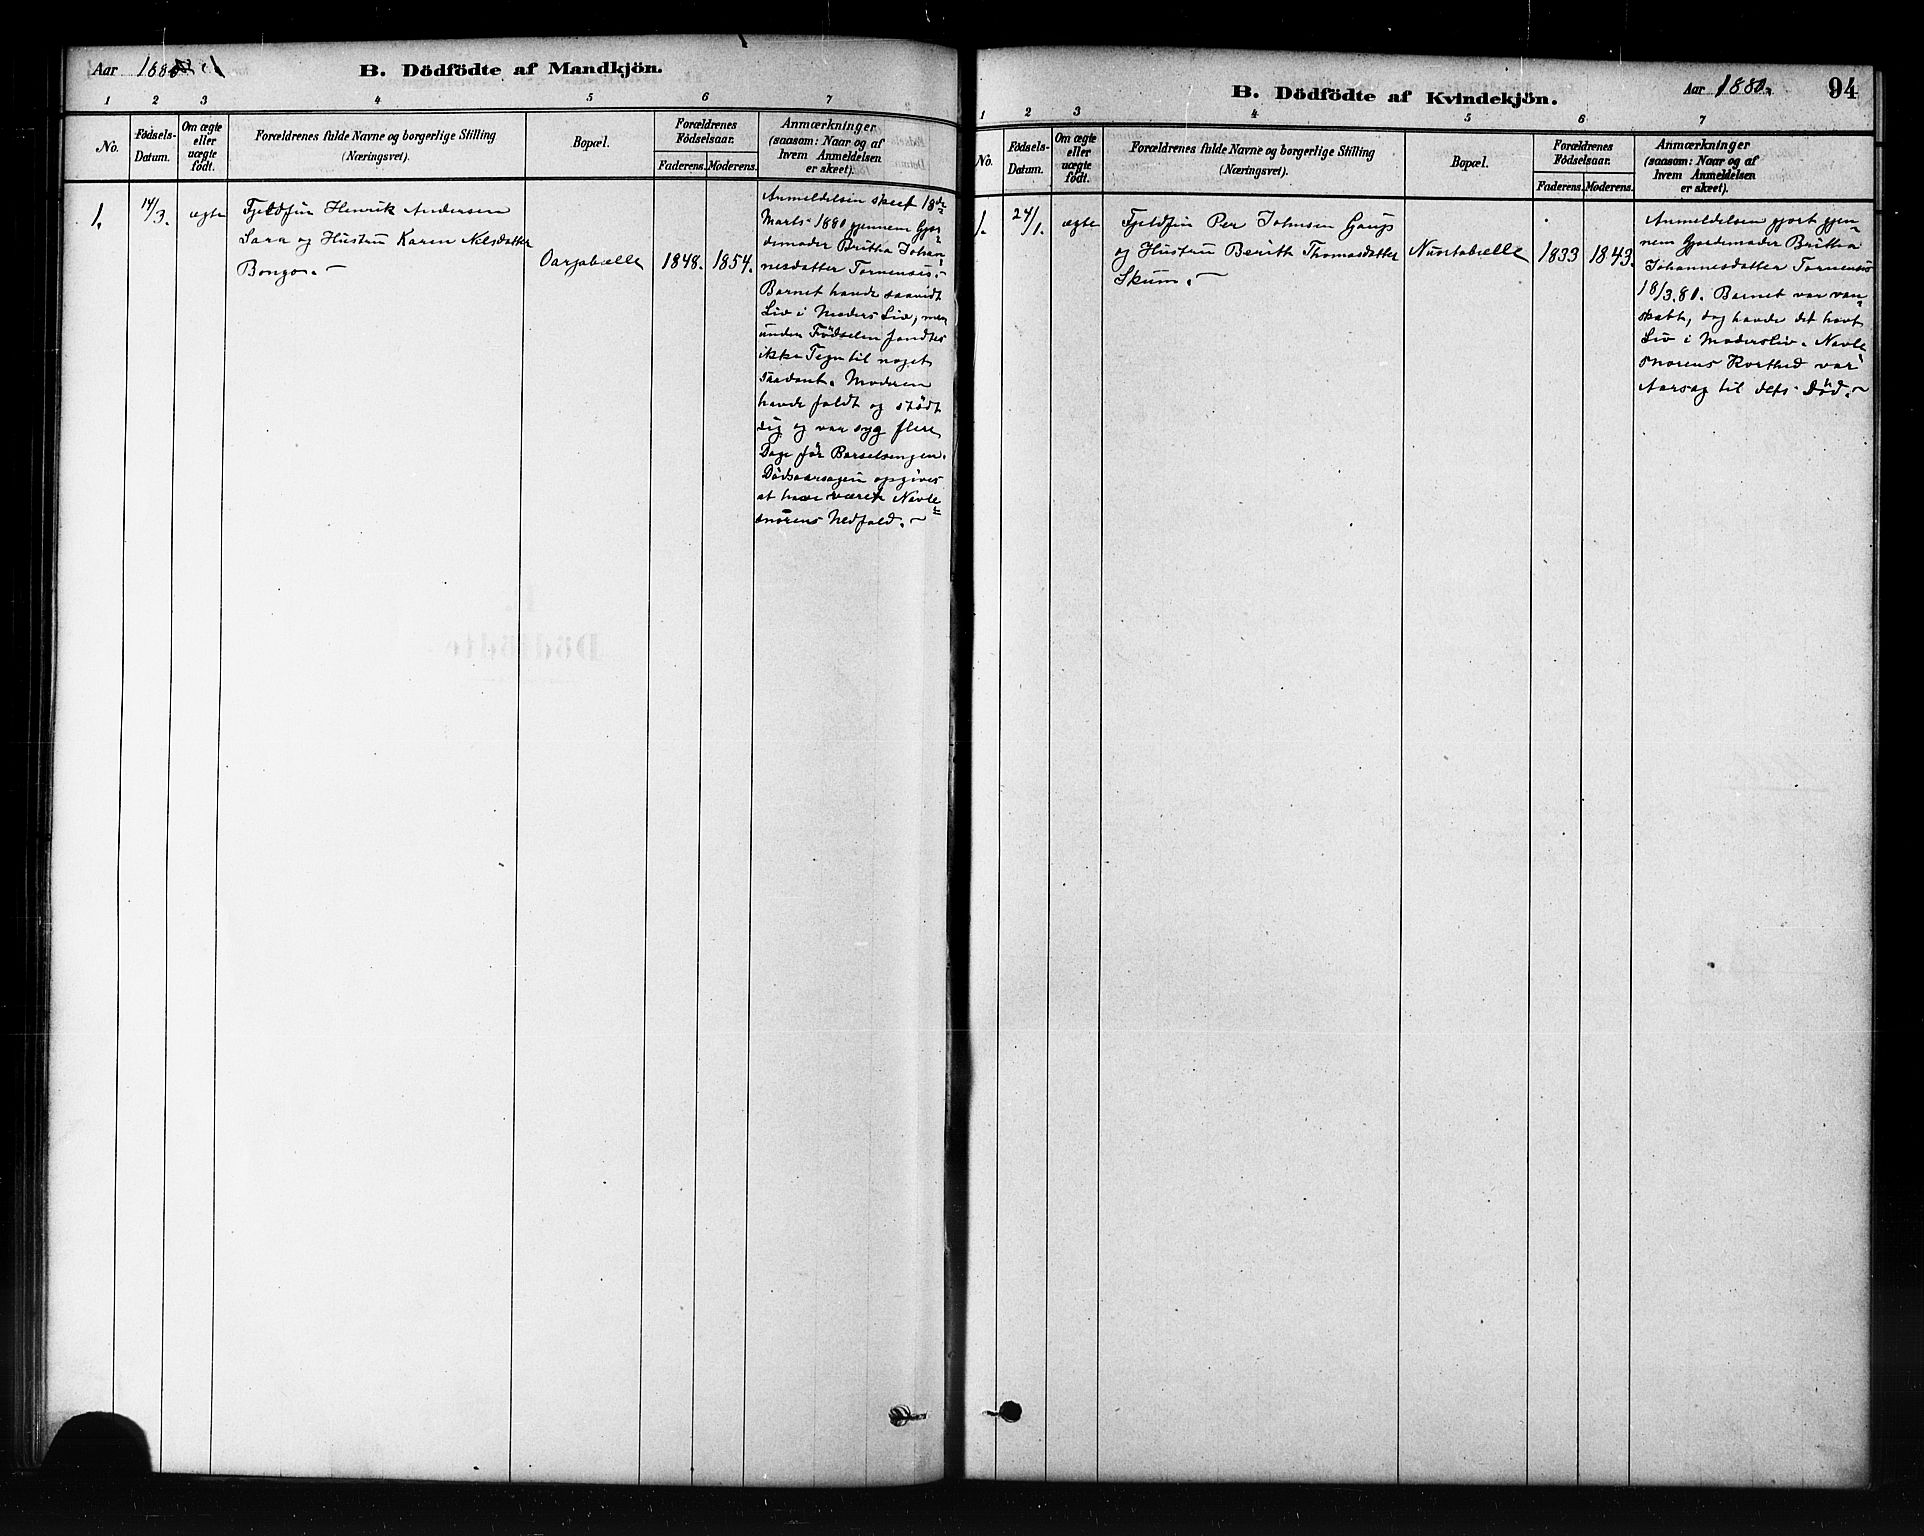 SATØ, Kautokeino sokneprestembete, H/Hb/L0002.klokk: Klokkerbok nr. 2, 1877-1896, s. 94